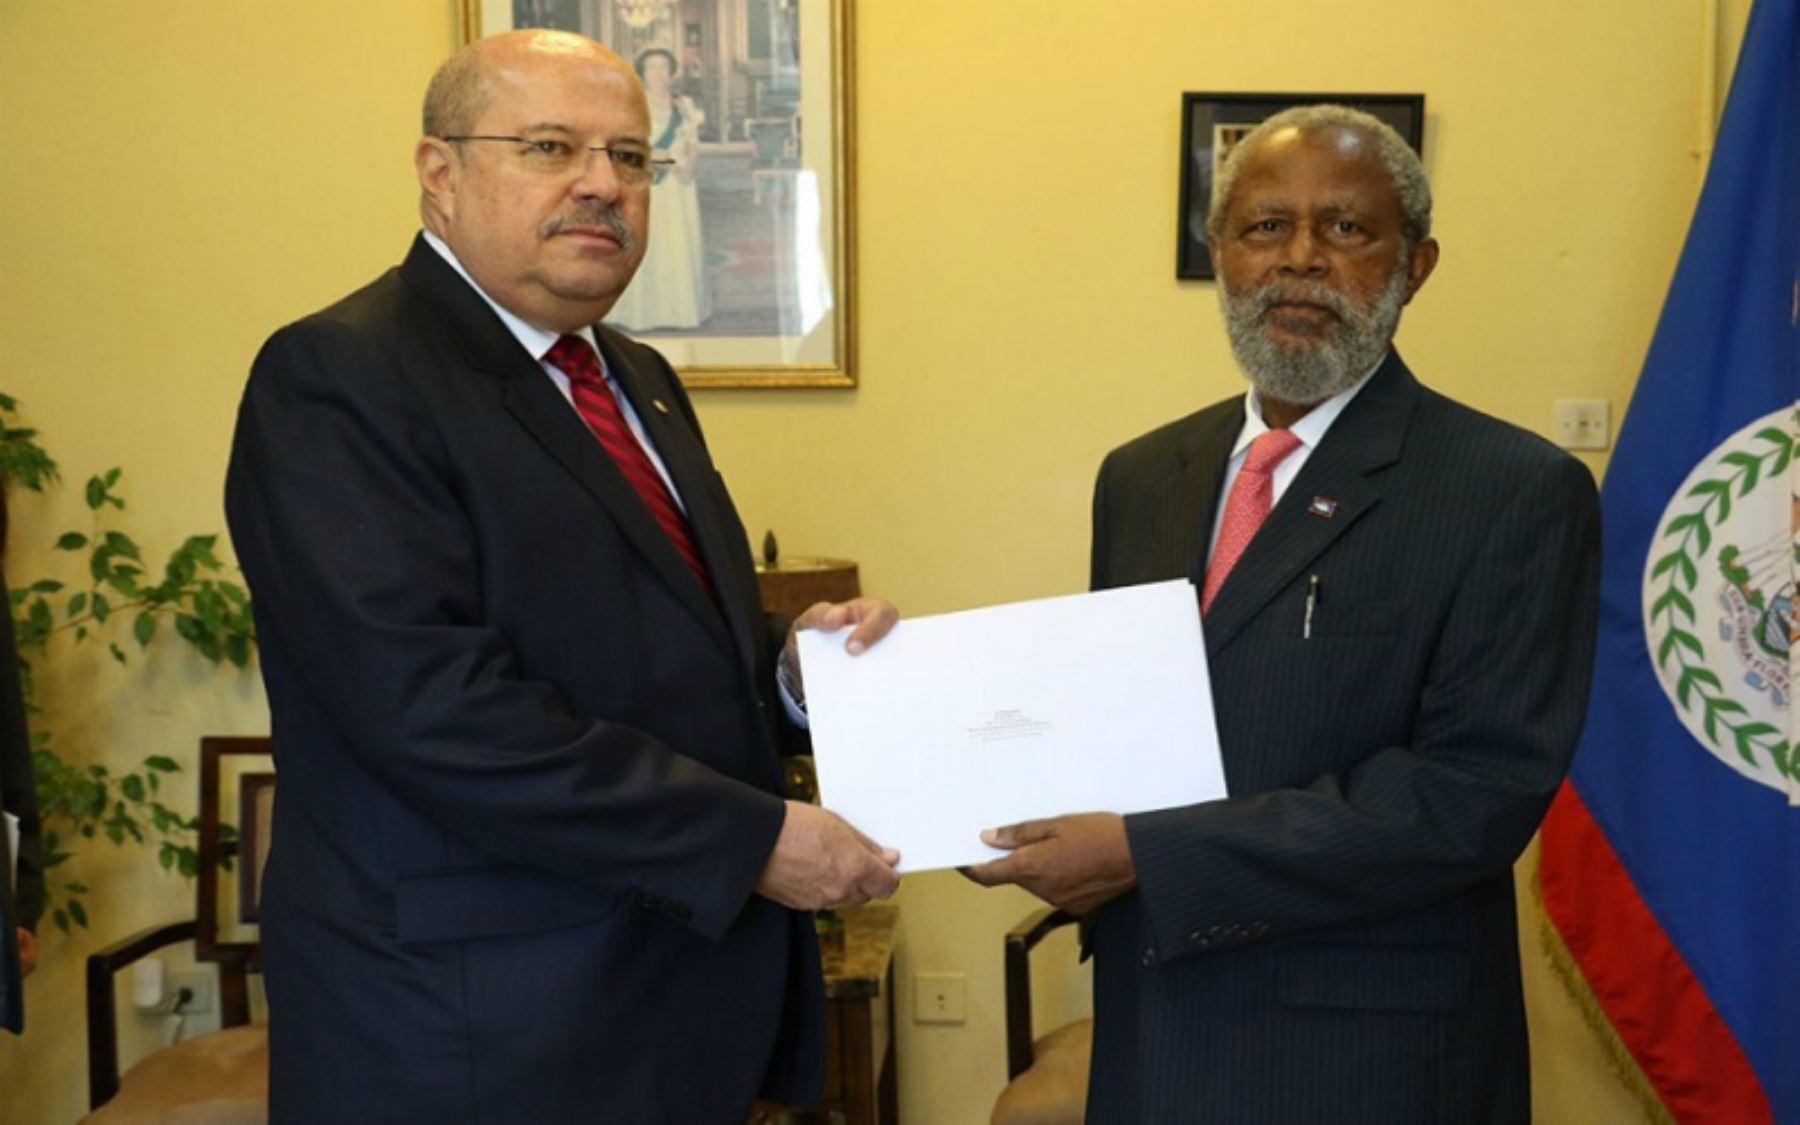 Peruvian Ambassador presents credentials in Belize